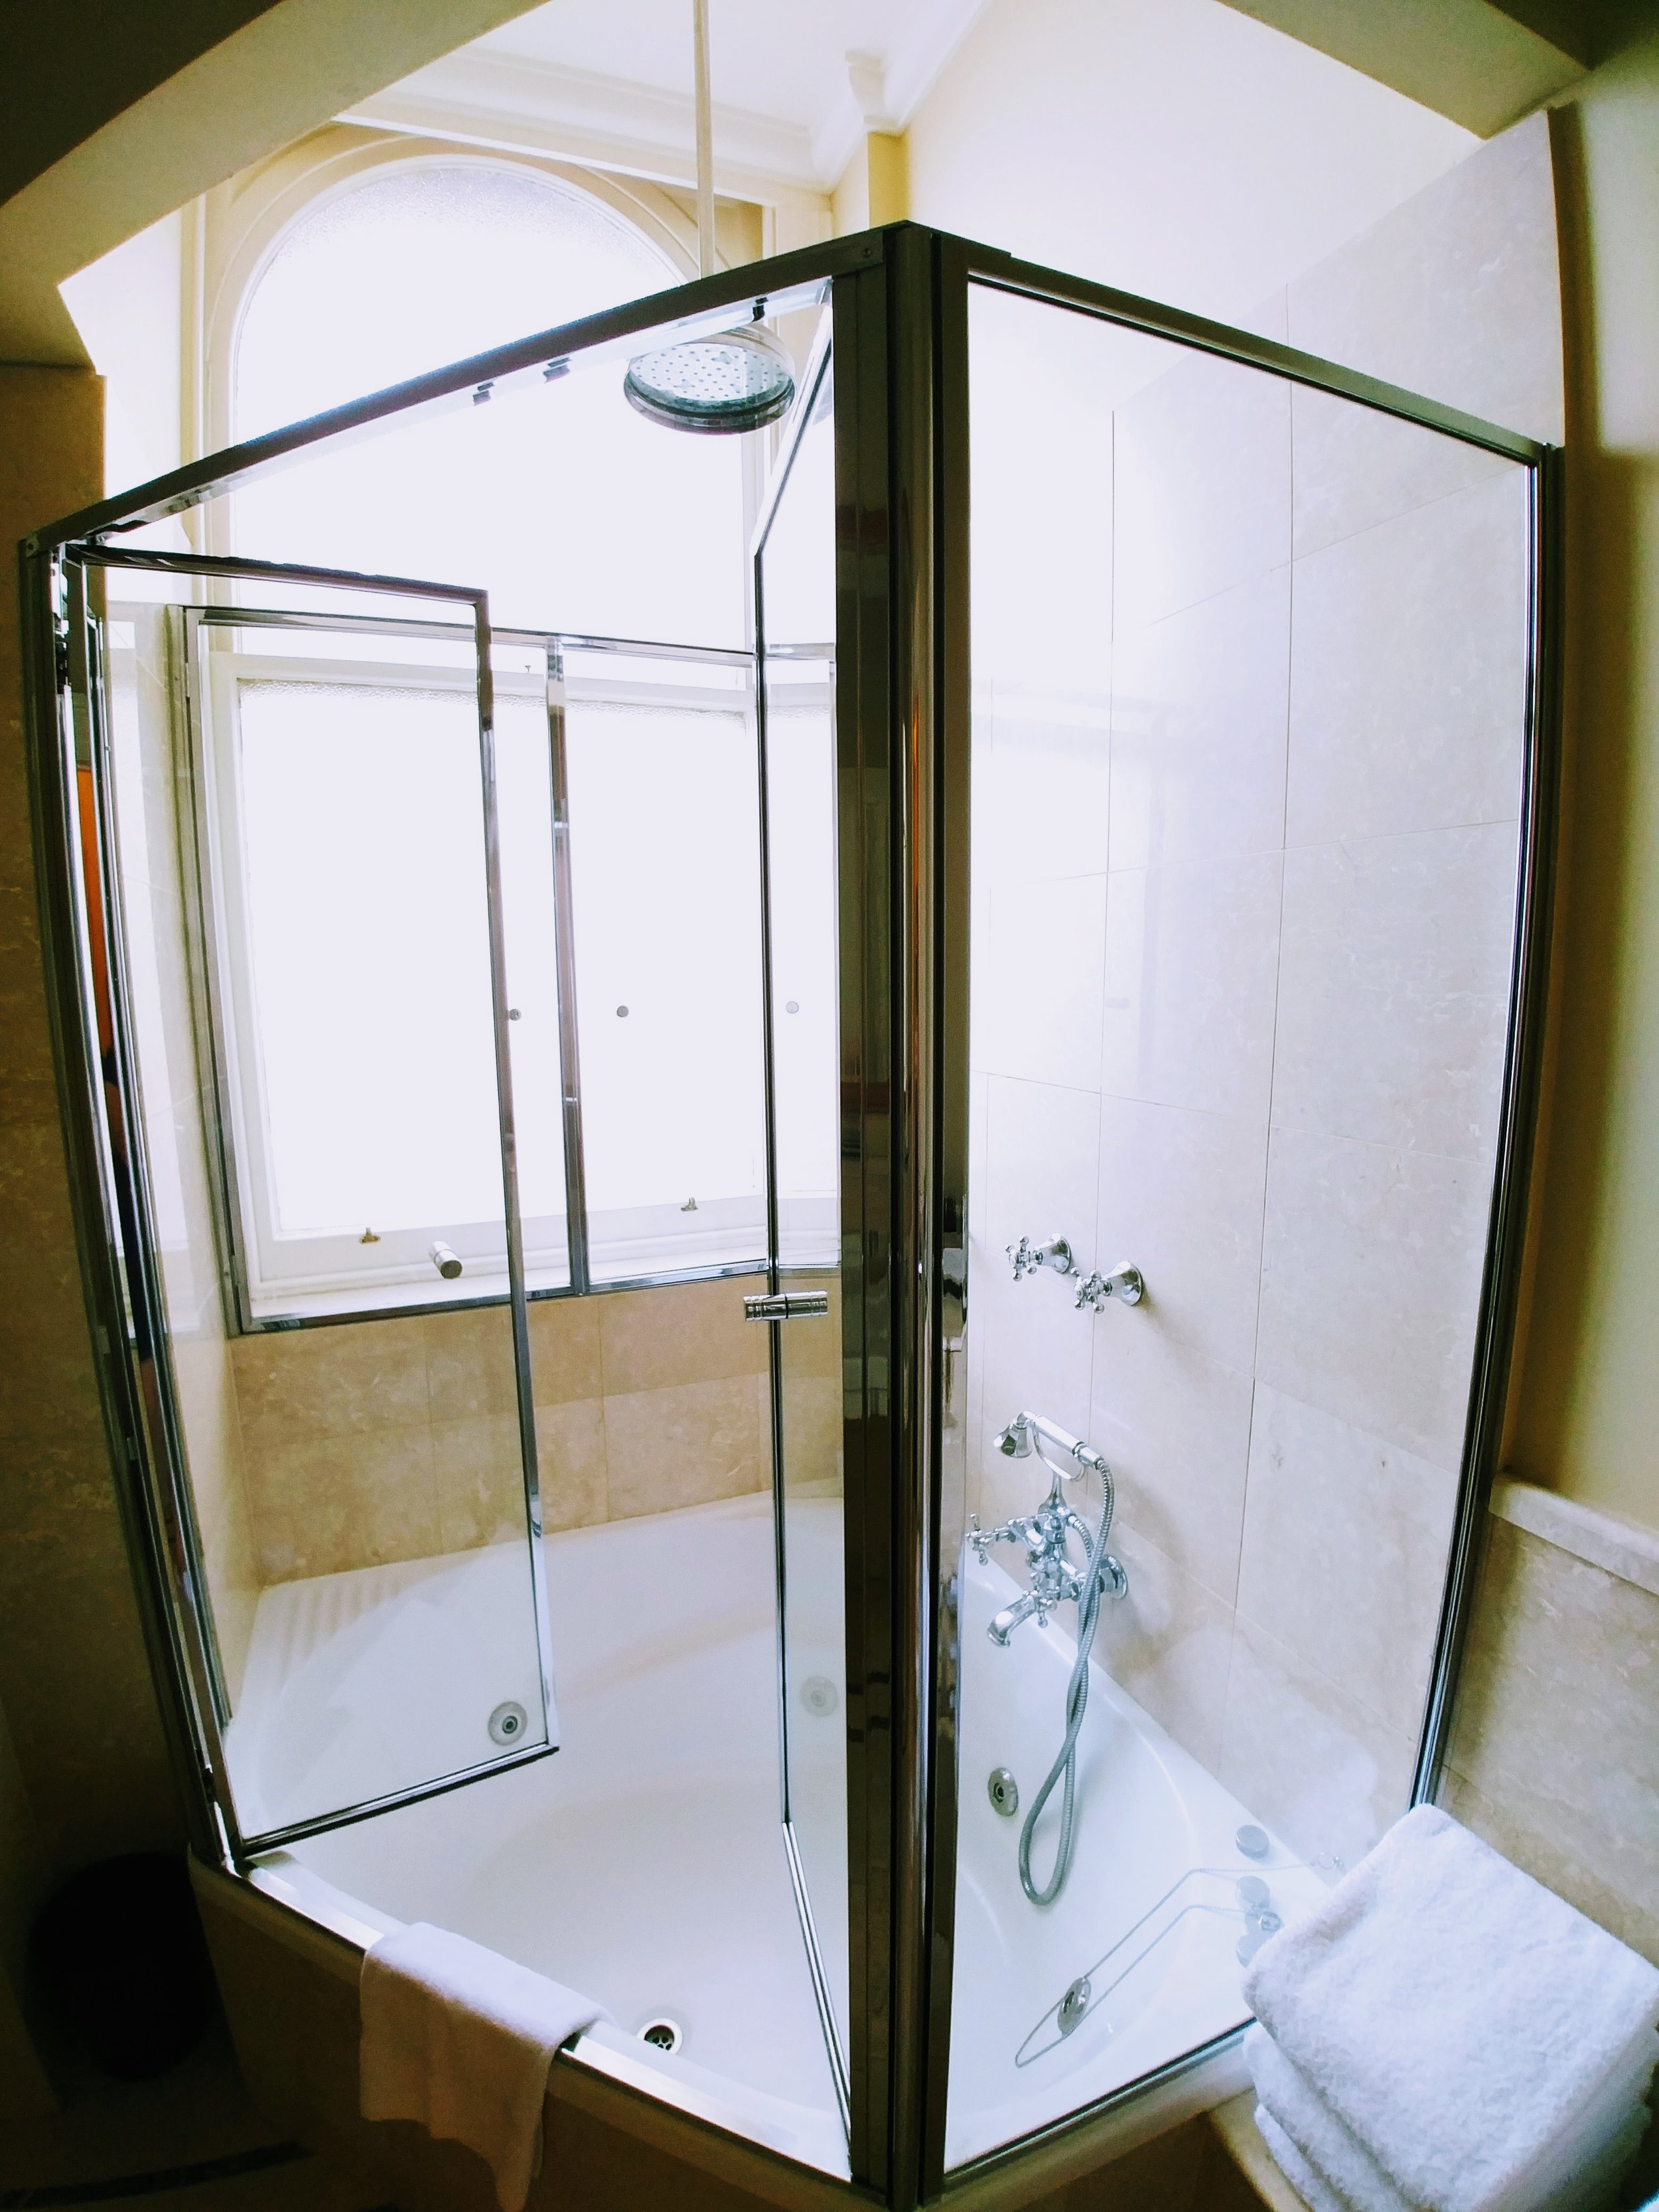 Love the modern yet somewhat vintage jacuzzi bathtub